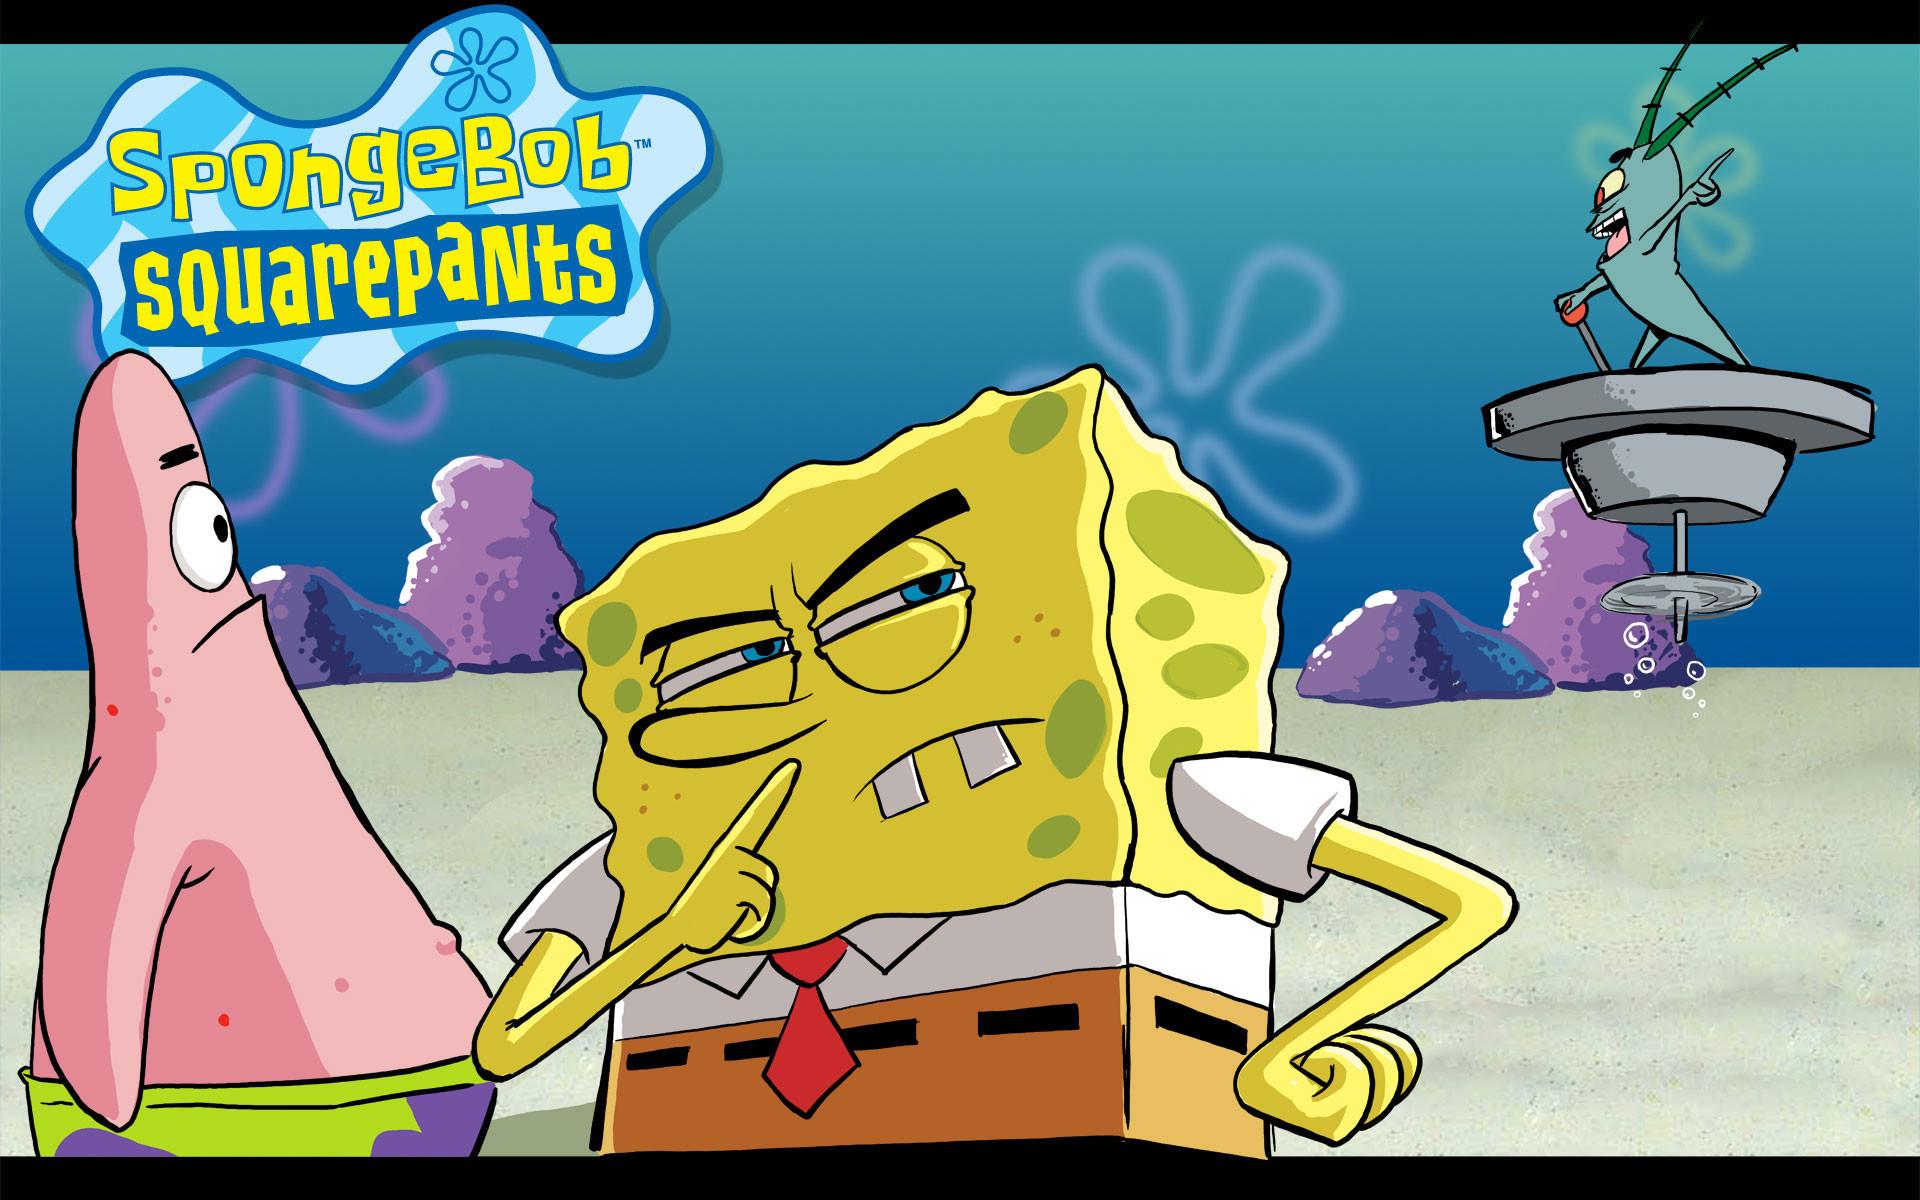 Gangster Spongebob Wallpapers (56+ images)